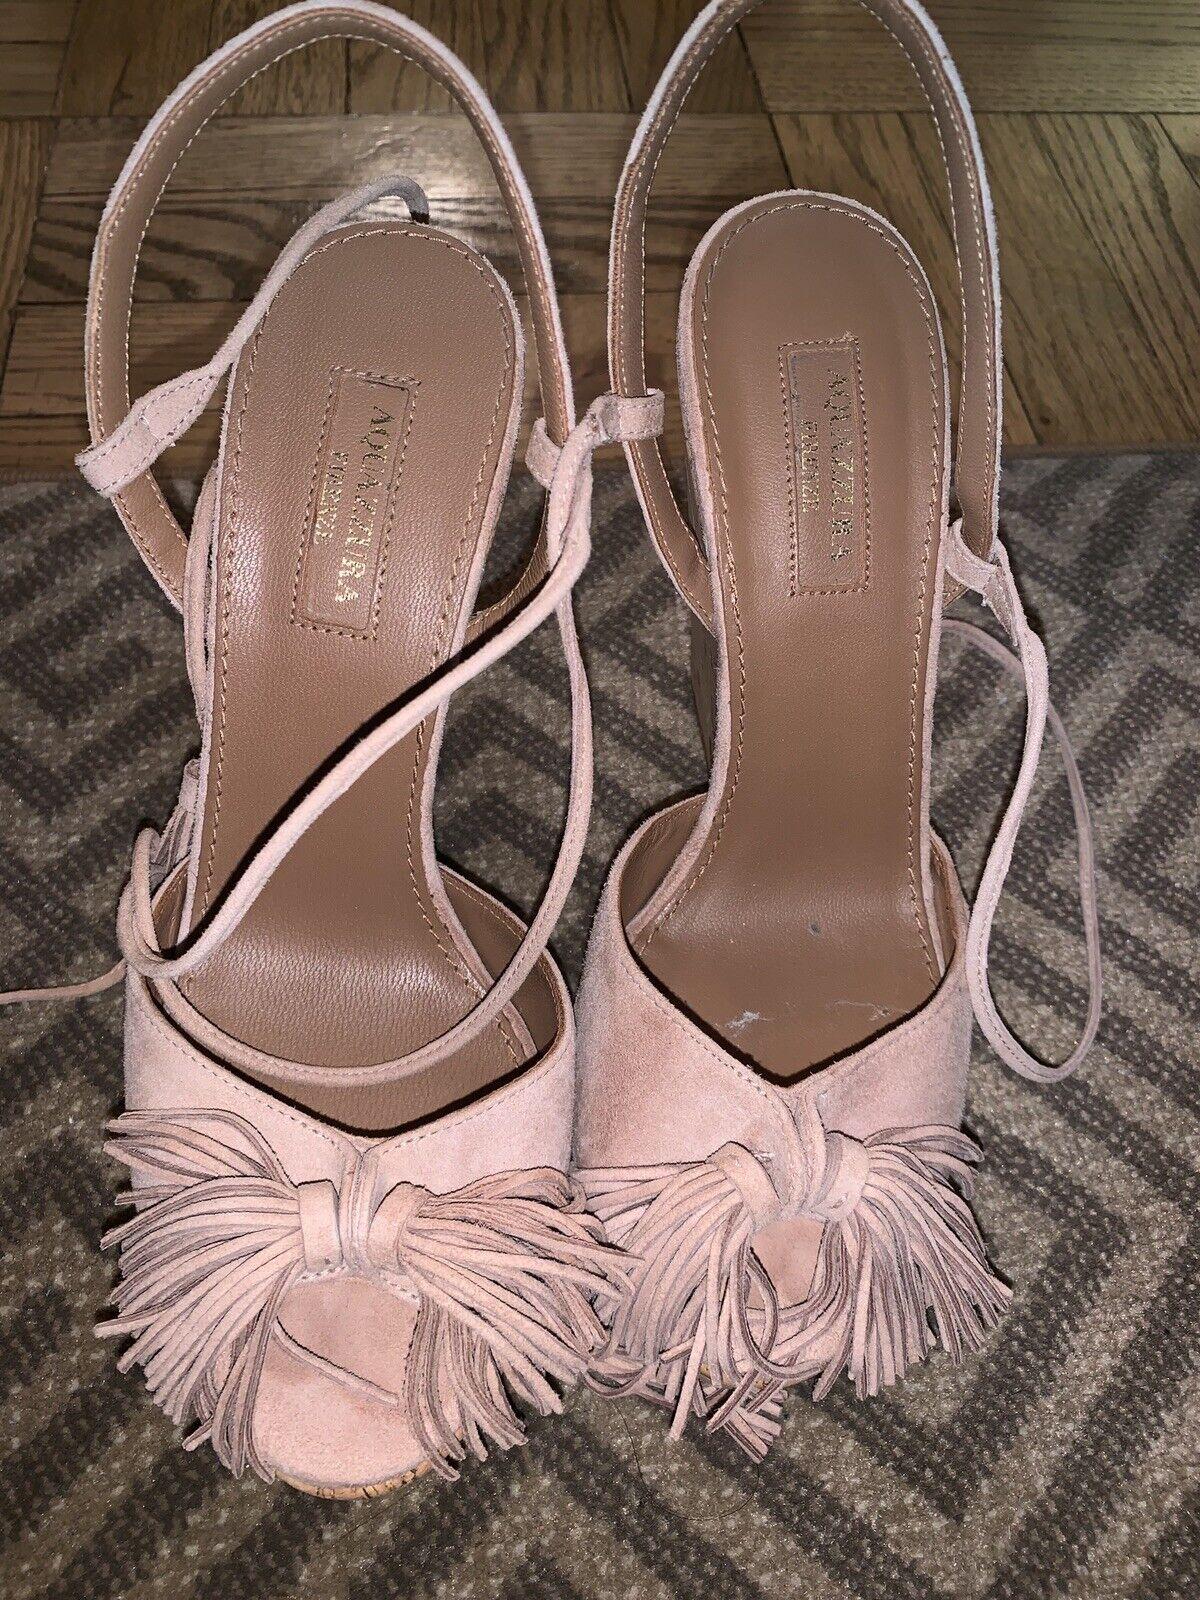 Aquazzura 'Wild One' Light Pink Suede Cork Wedges w Tassels Sandals shoes 37